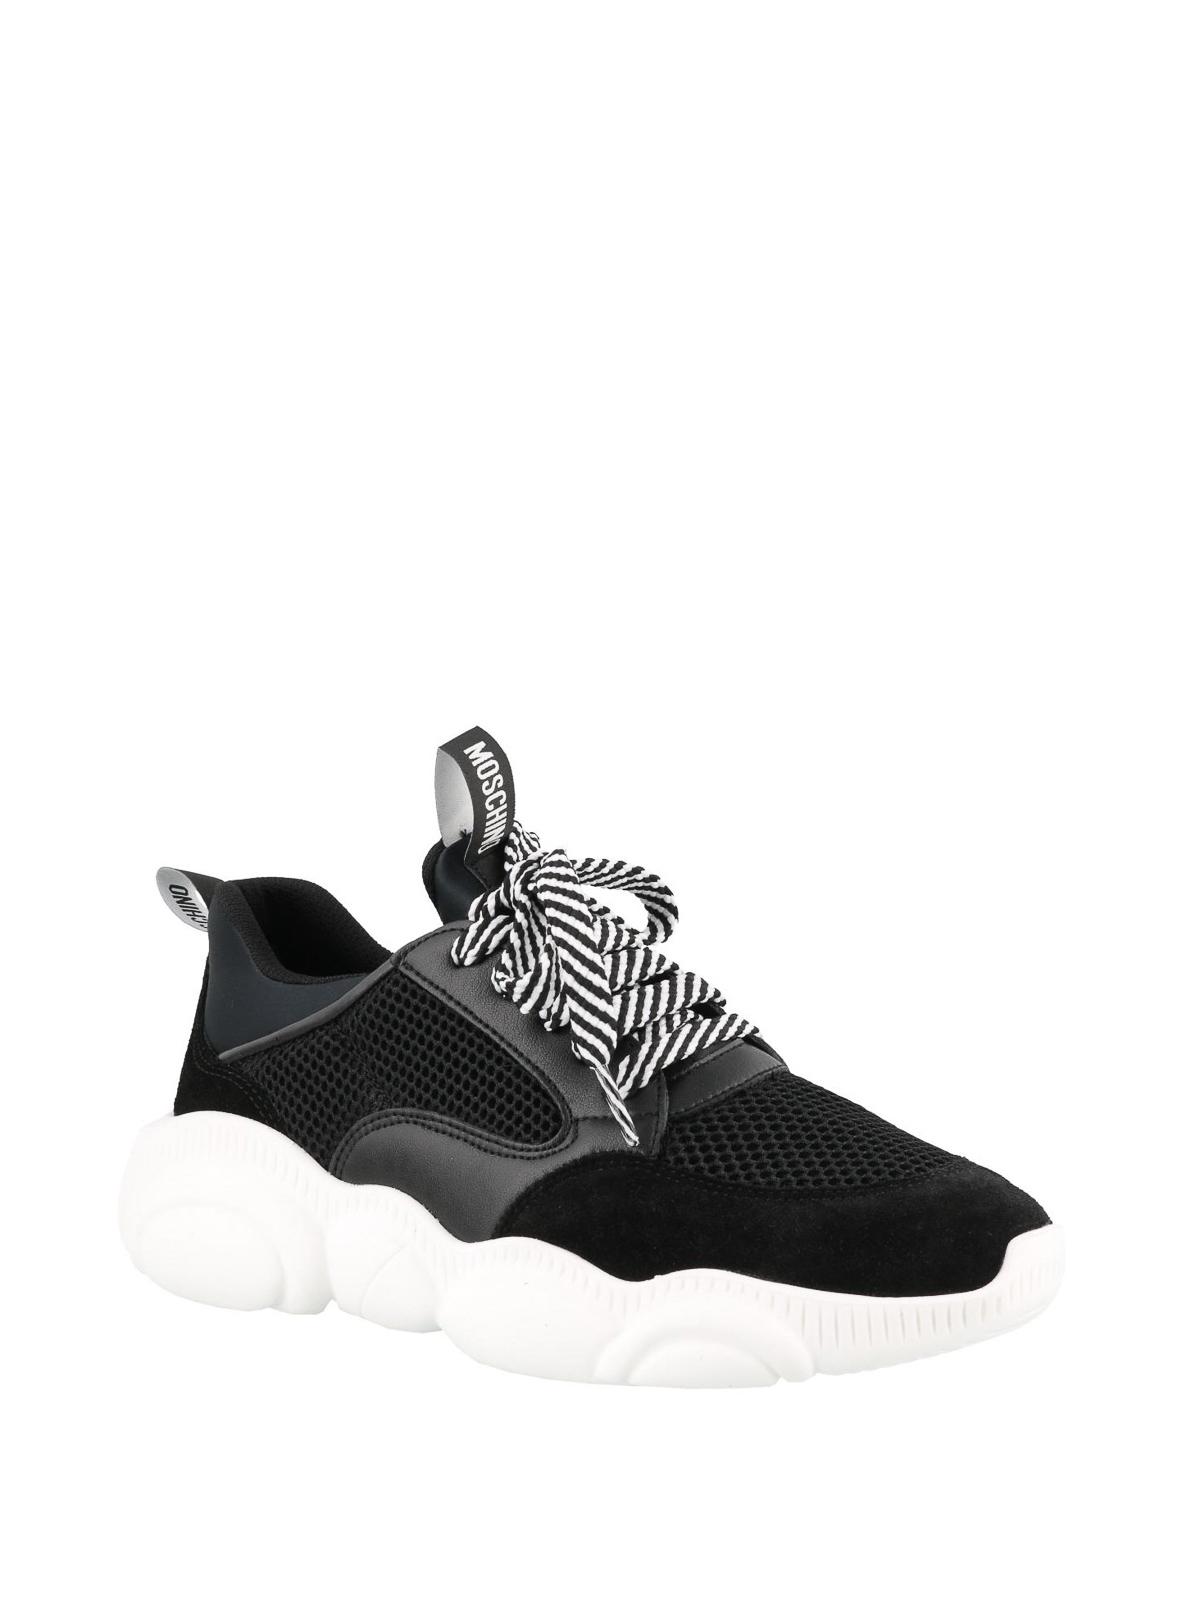 Moschino - Teddy Run black sneakers